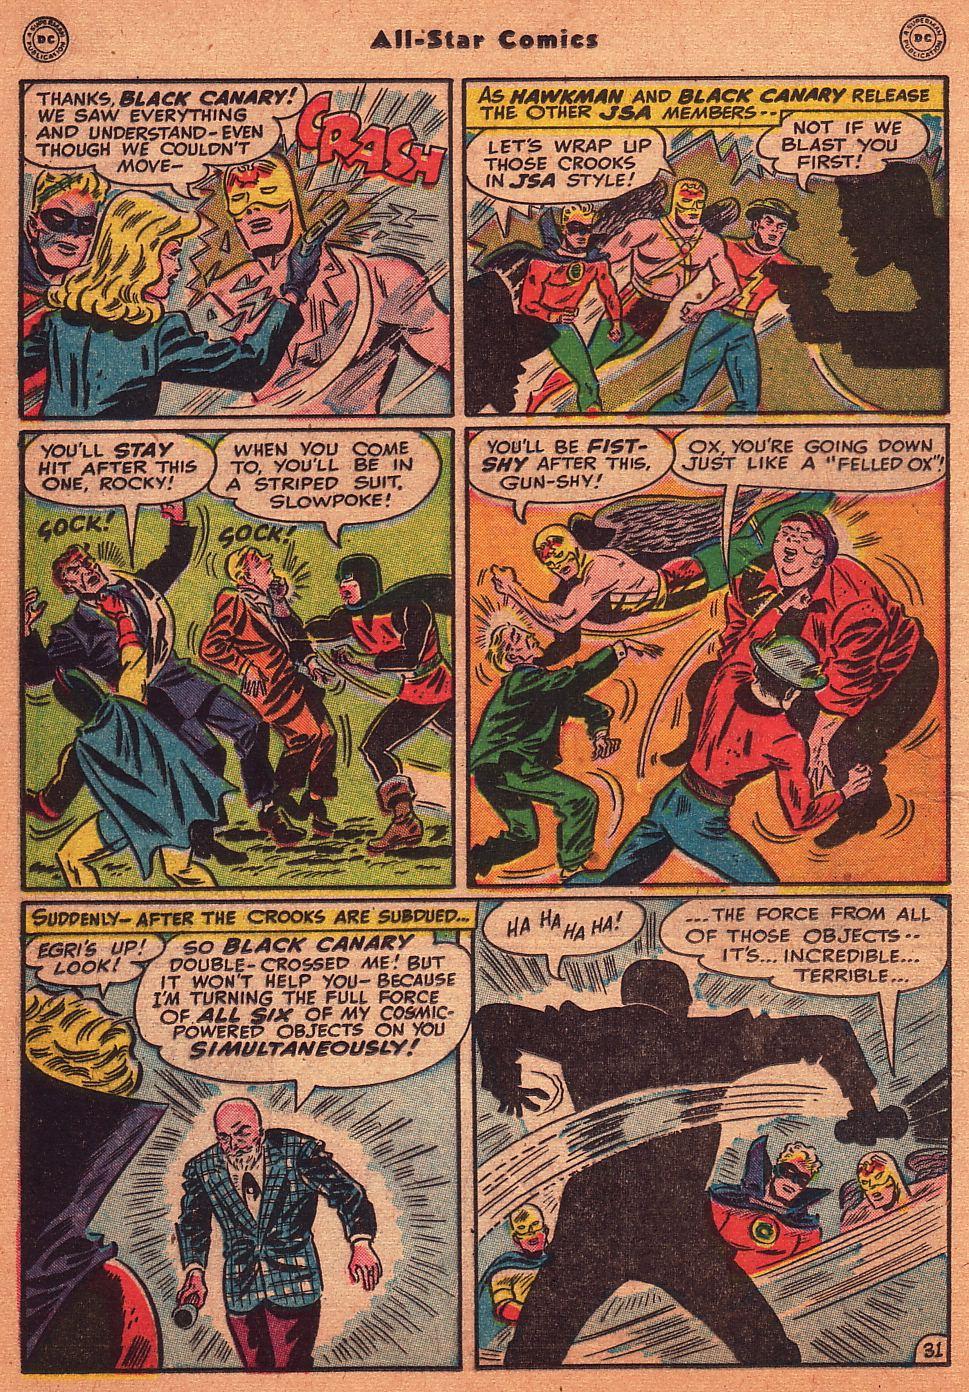 Read online All-Star Comics comic -  Issue #45 - 36